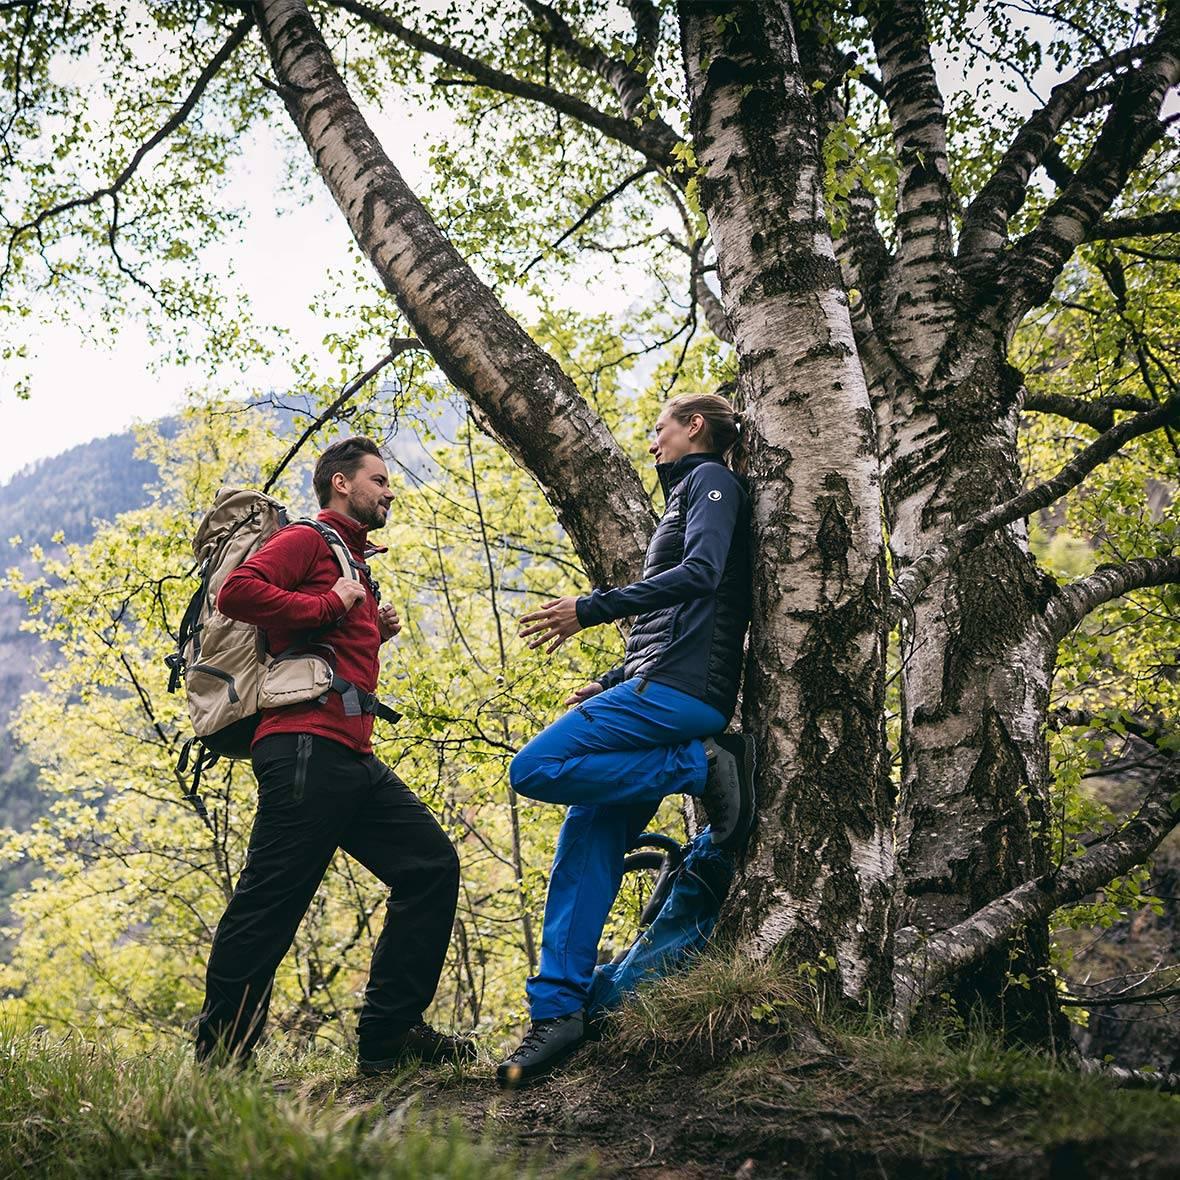 Sherpa Outdoor Bekleidung I bei Bestswiss